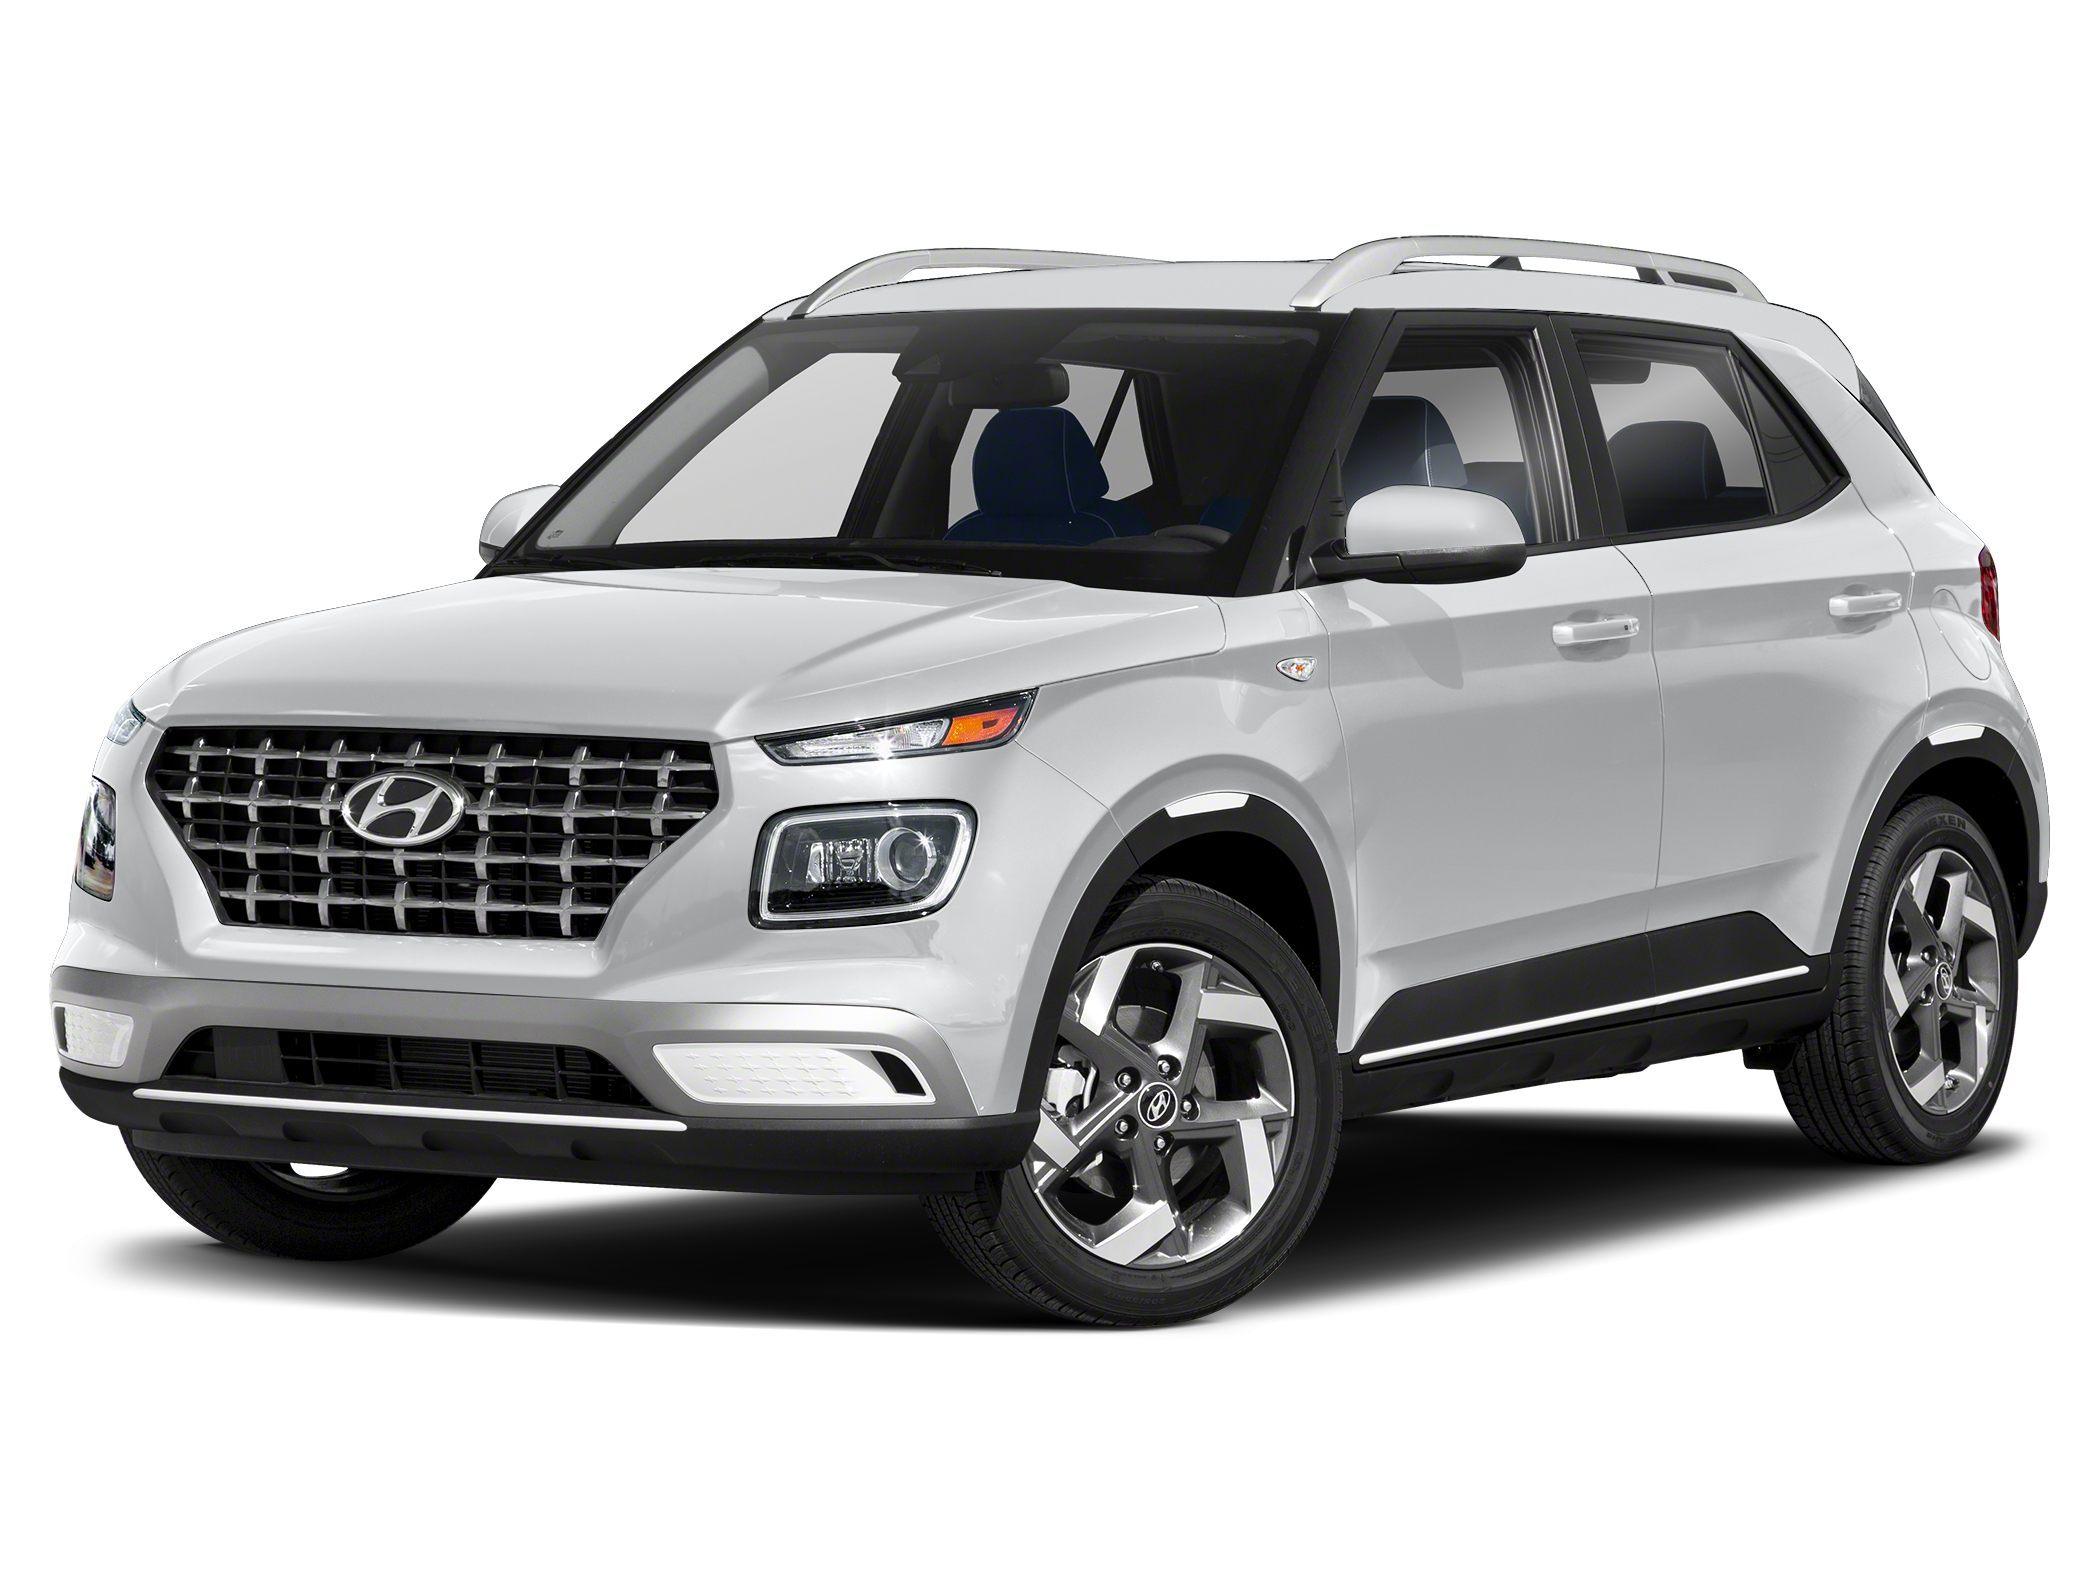 2022 Hyundai Venue SUV